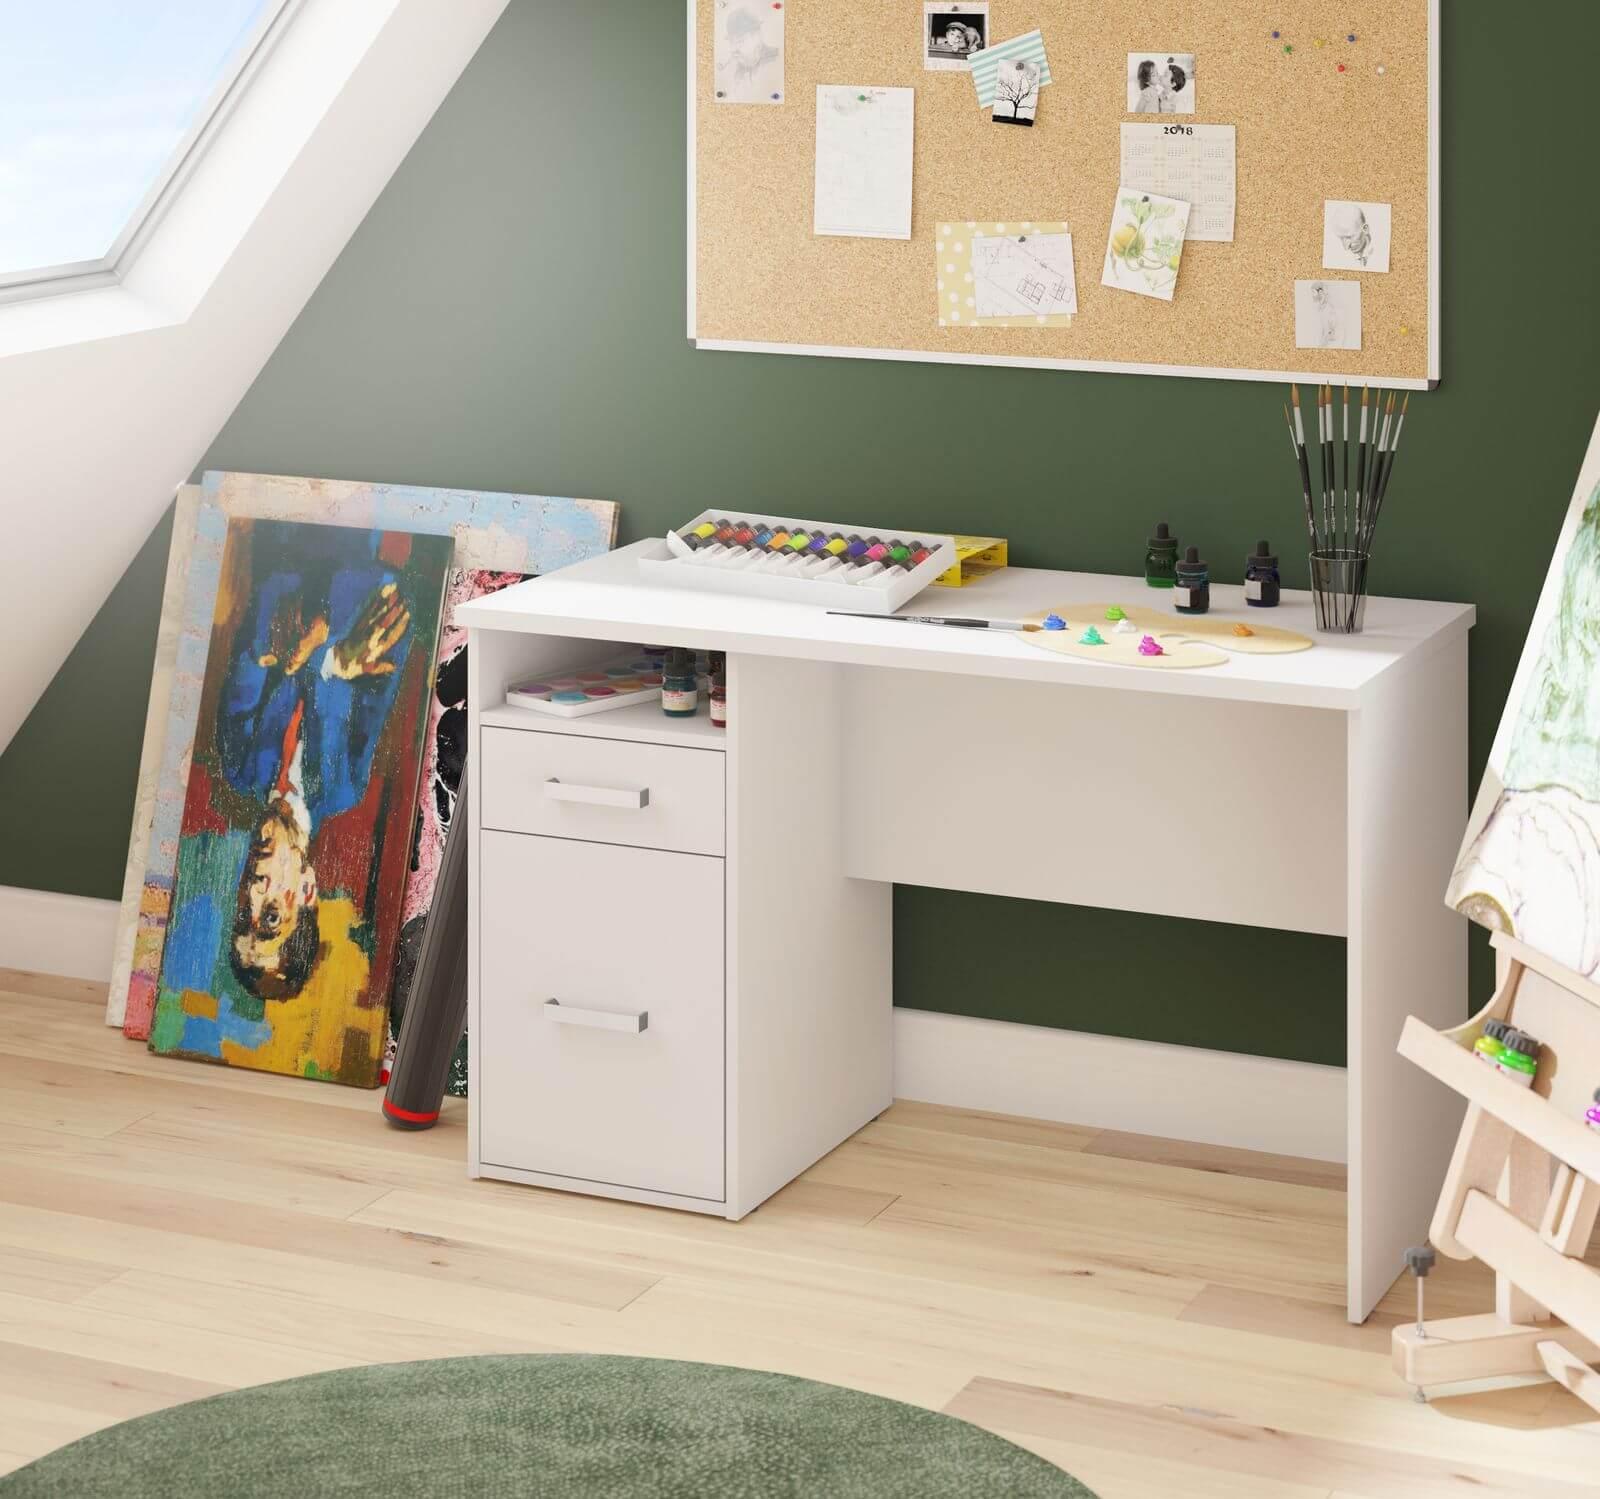 Petit bureau avec mur vert